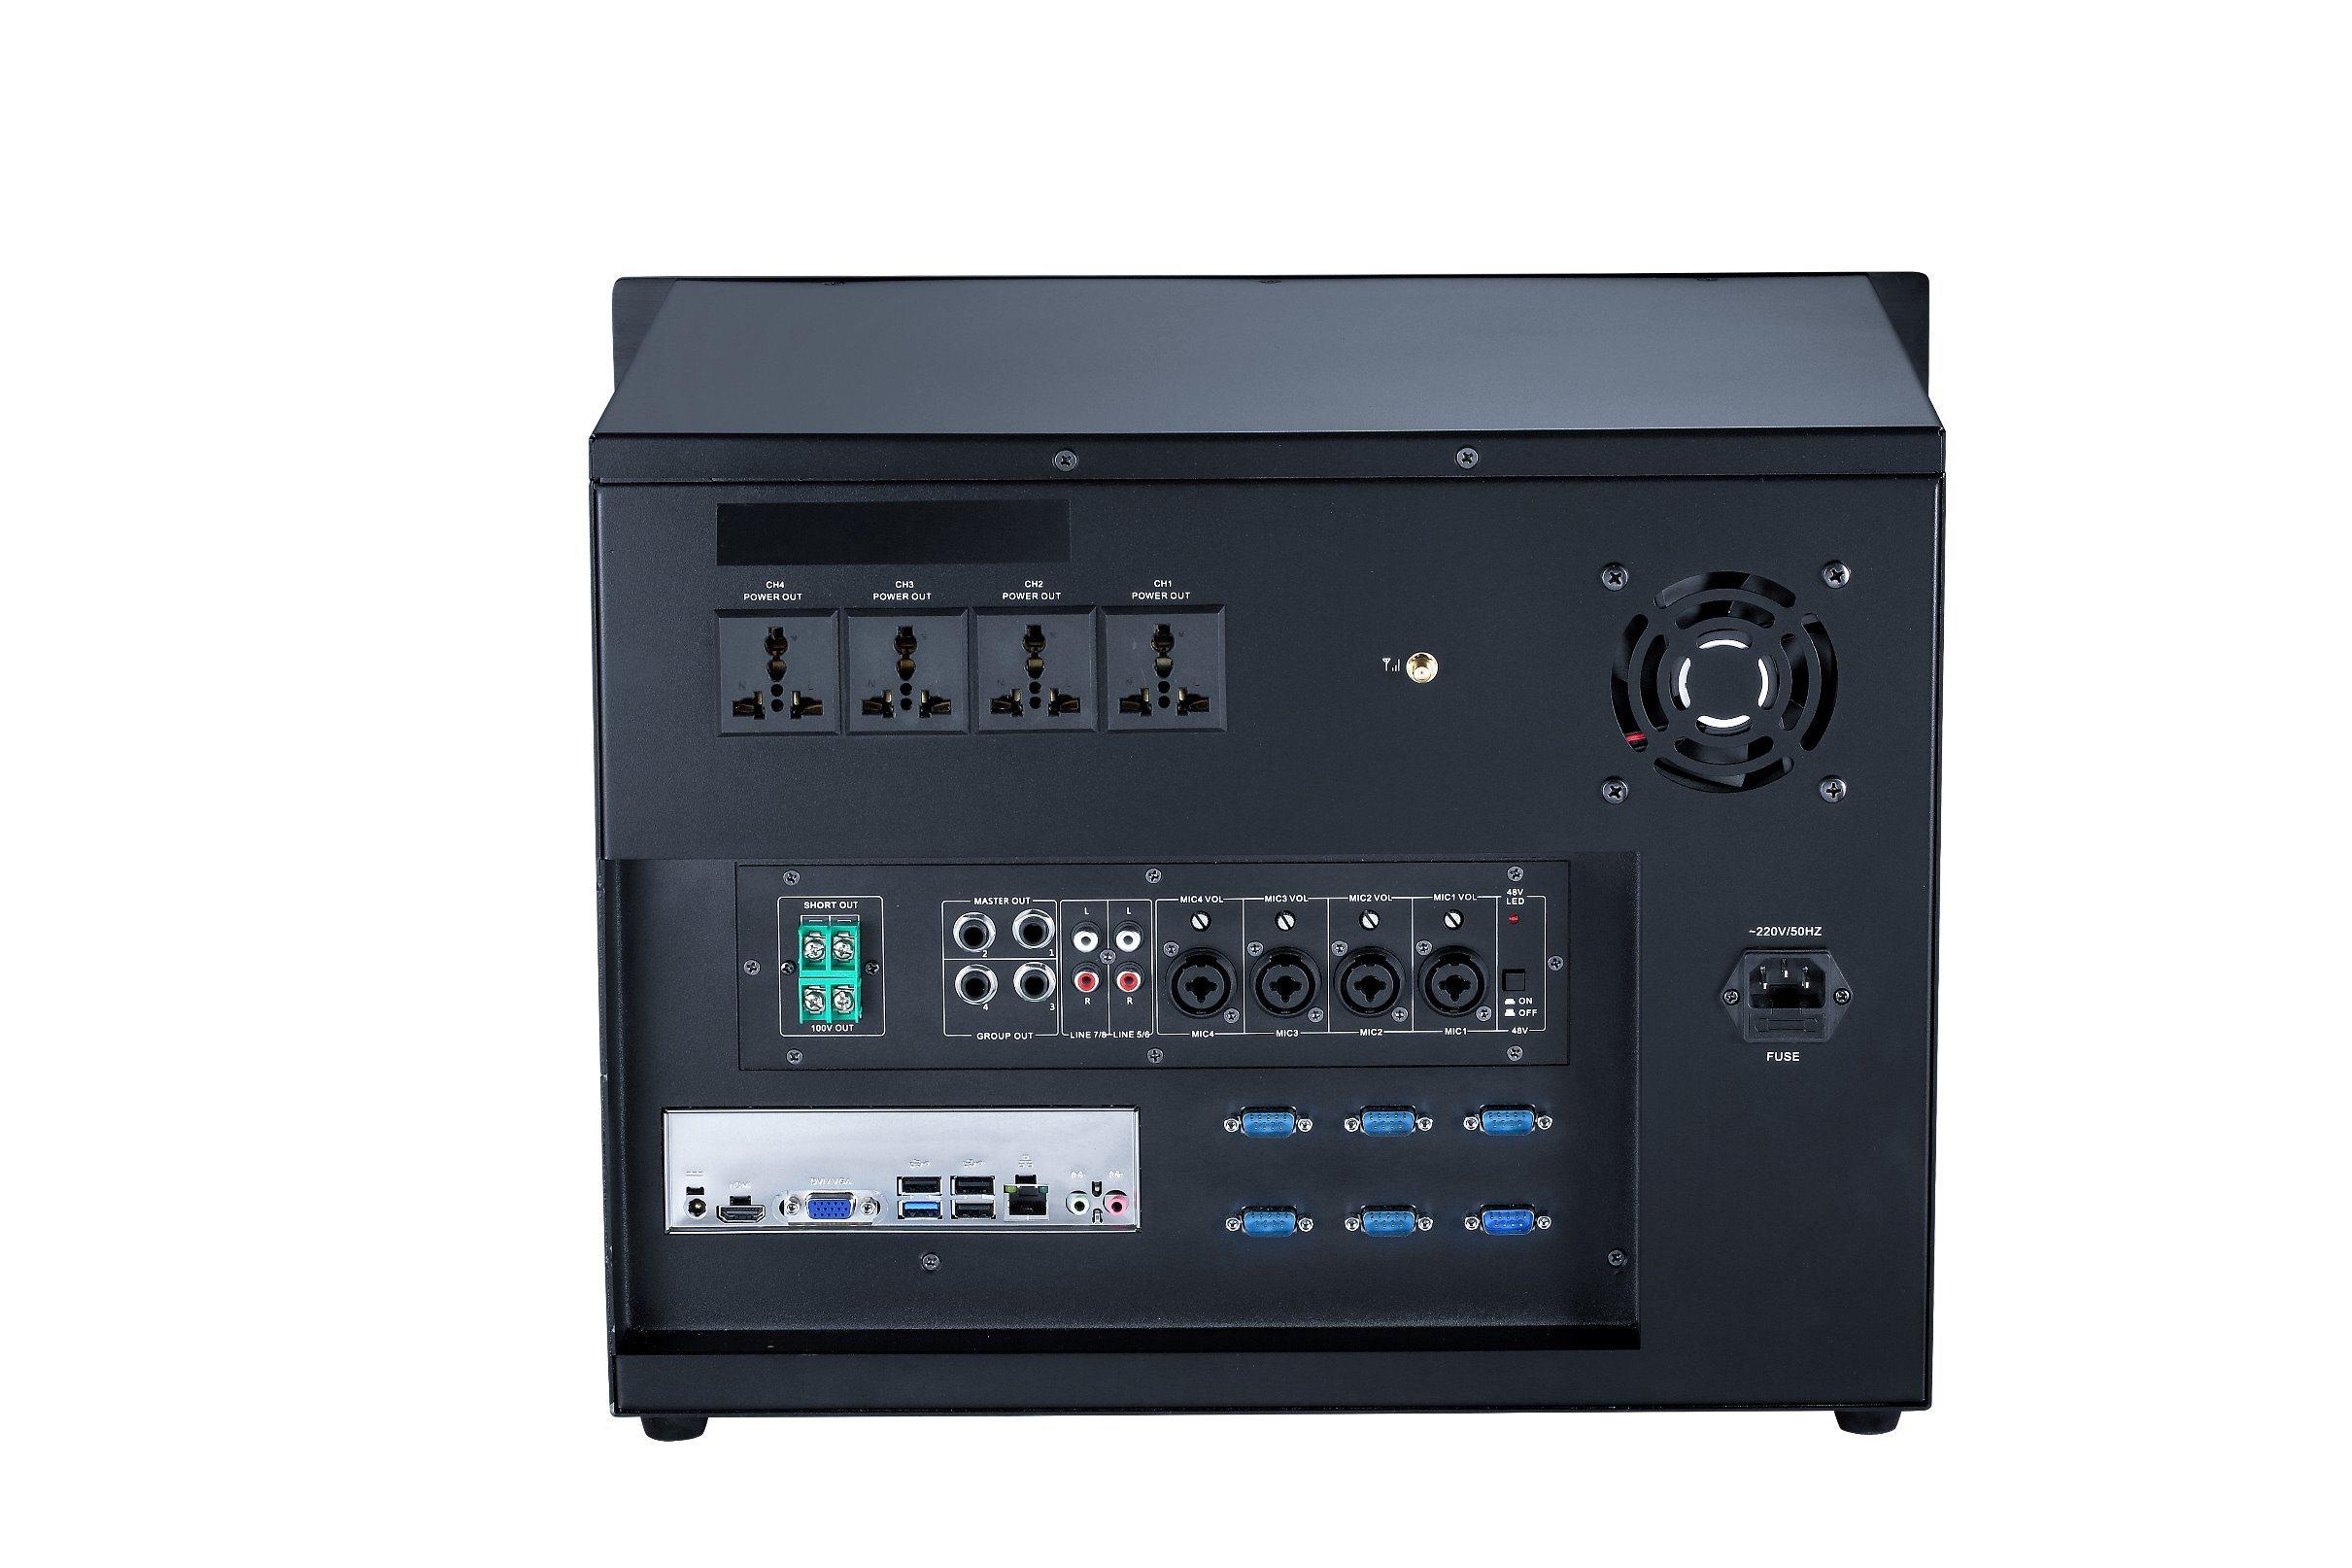 IP Network System 17 Inch Server Se-5800